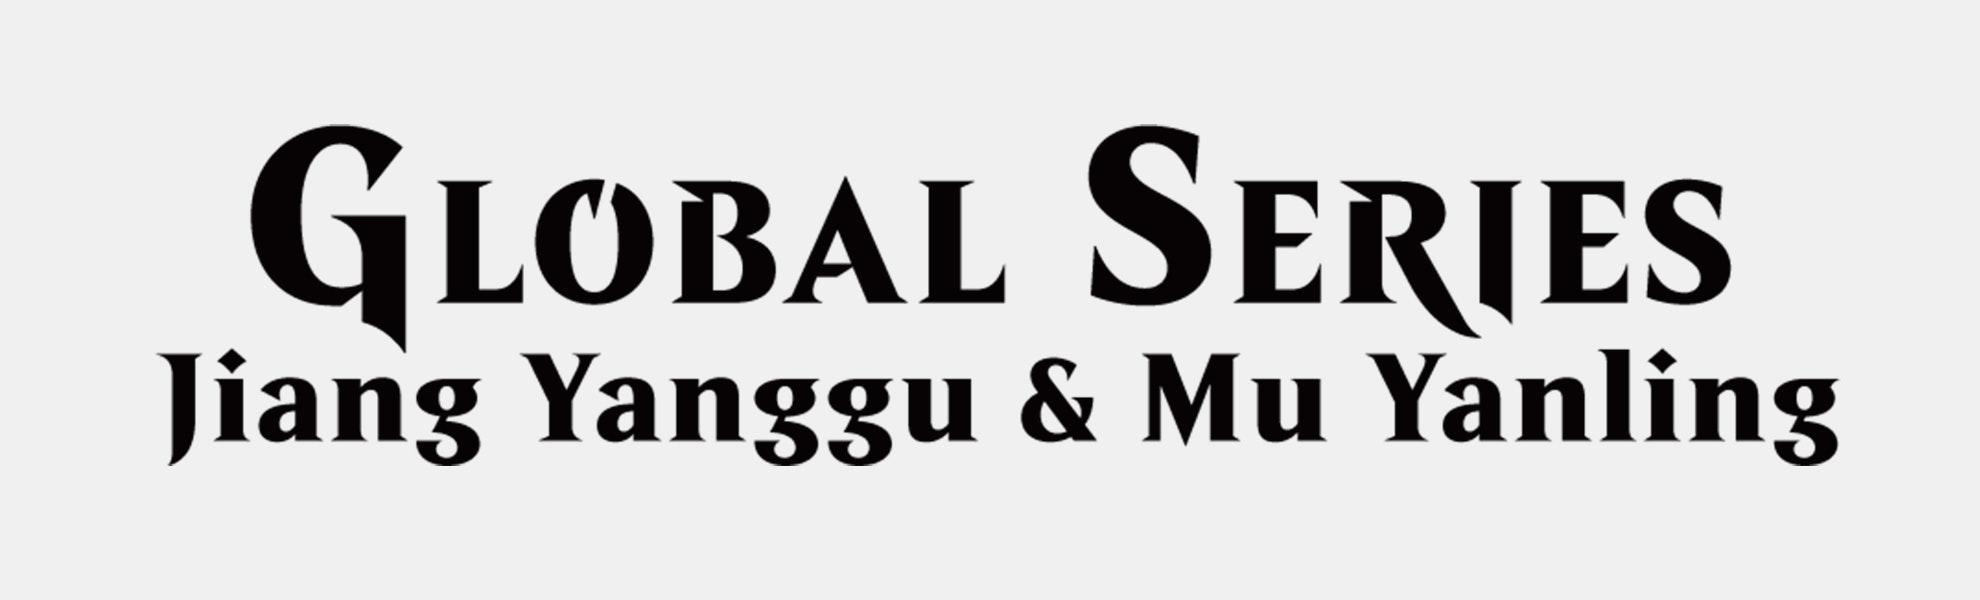 Global Series Jiang Yanggu vs. Mu Yanling Preorder2